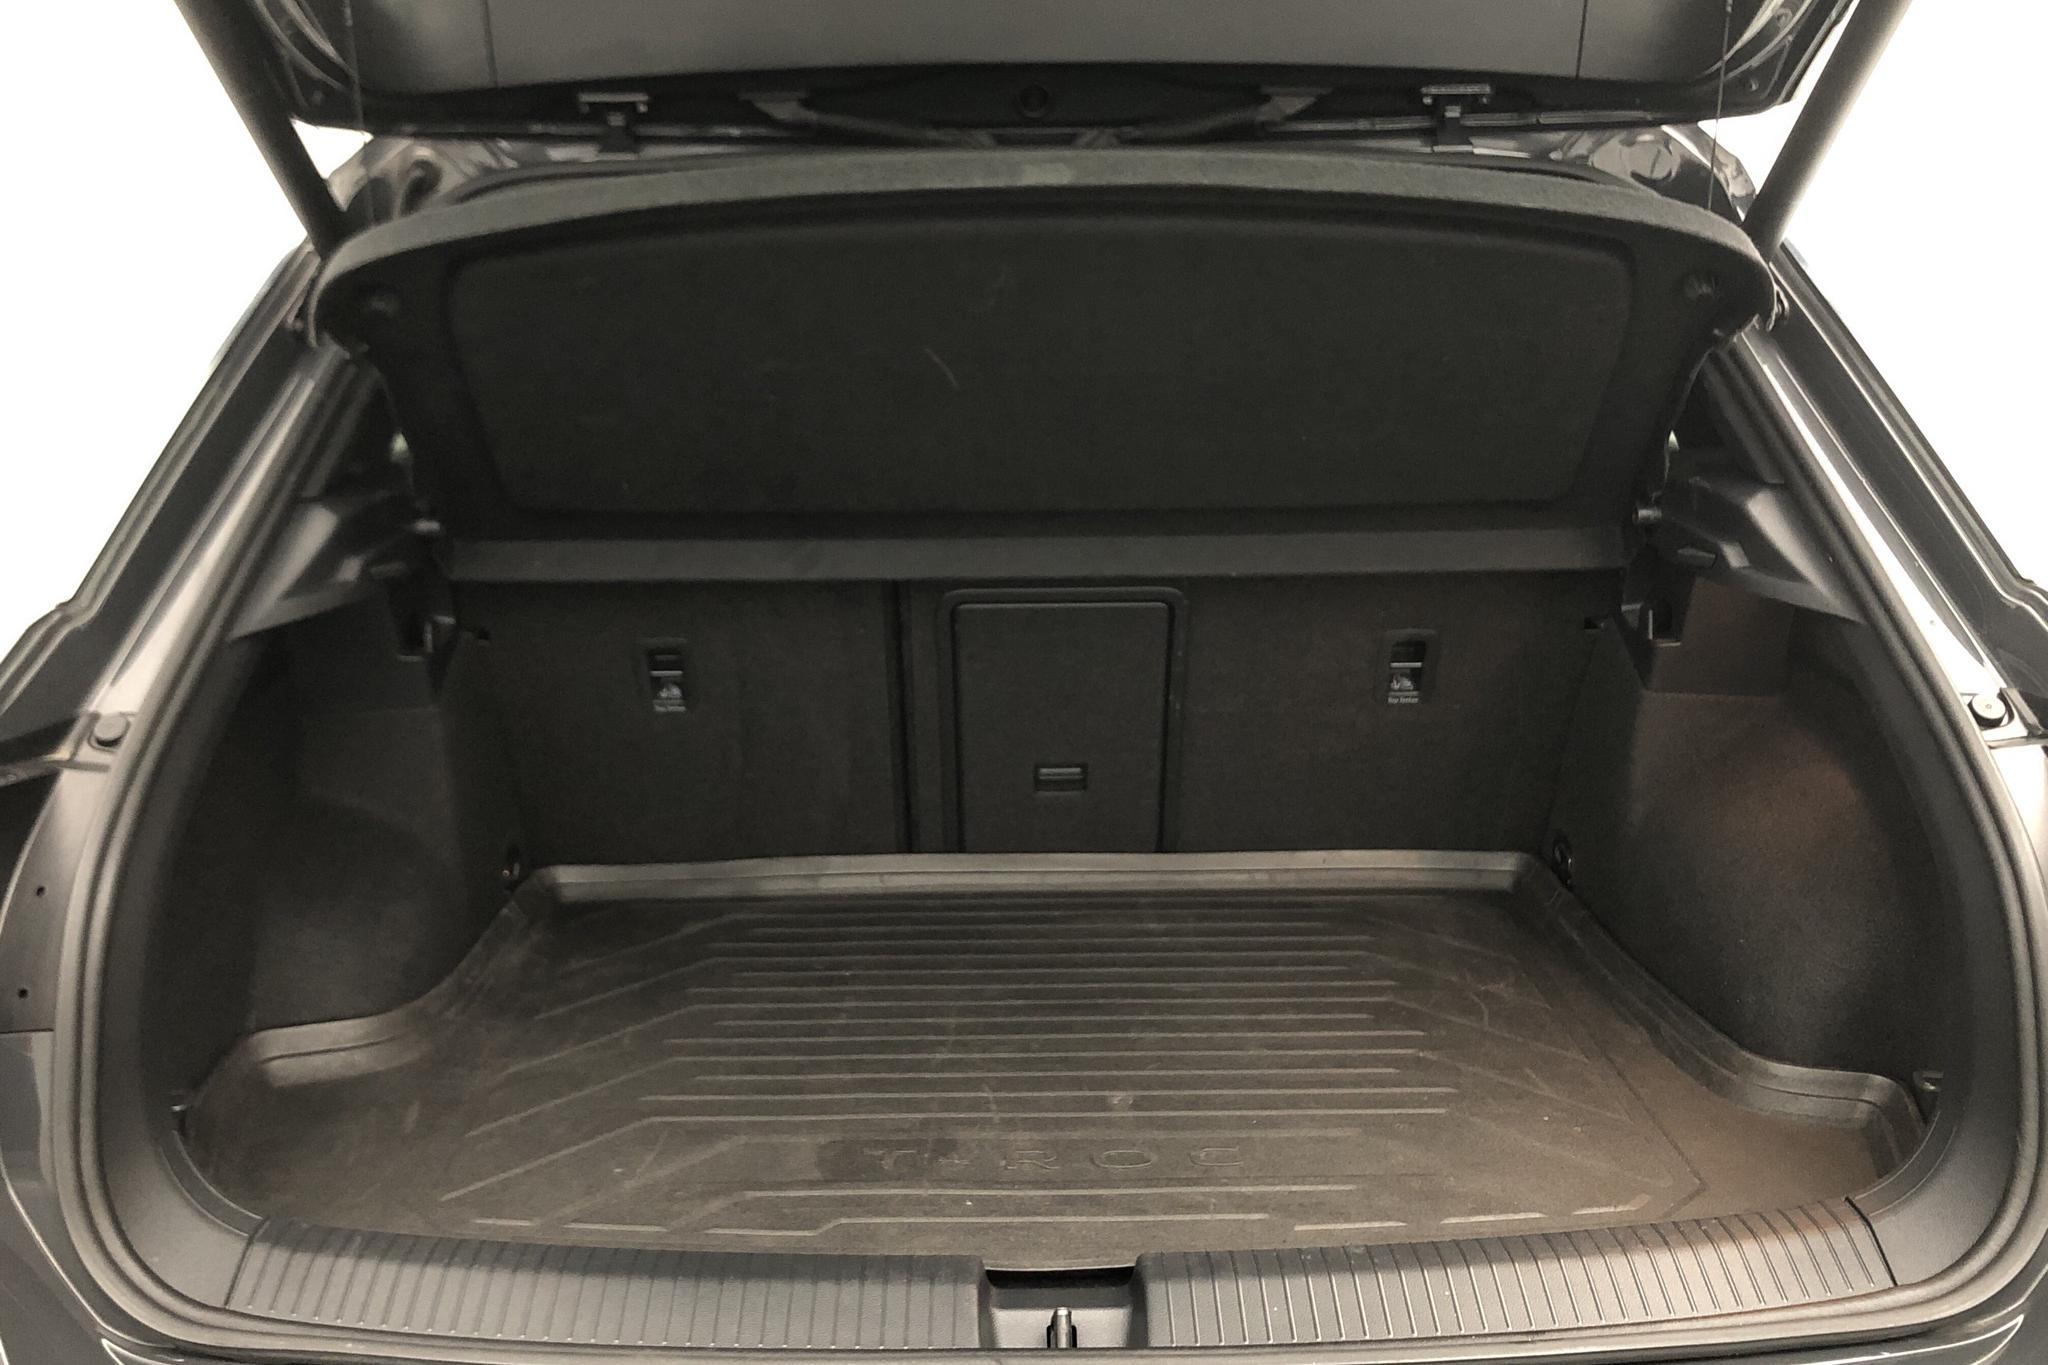 VW T-Roc 2.0 TSI 4MOTION (190hk) - 43 560 km - Automatic - Dark Grey - 2019